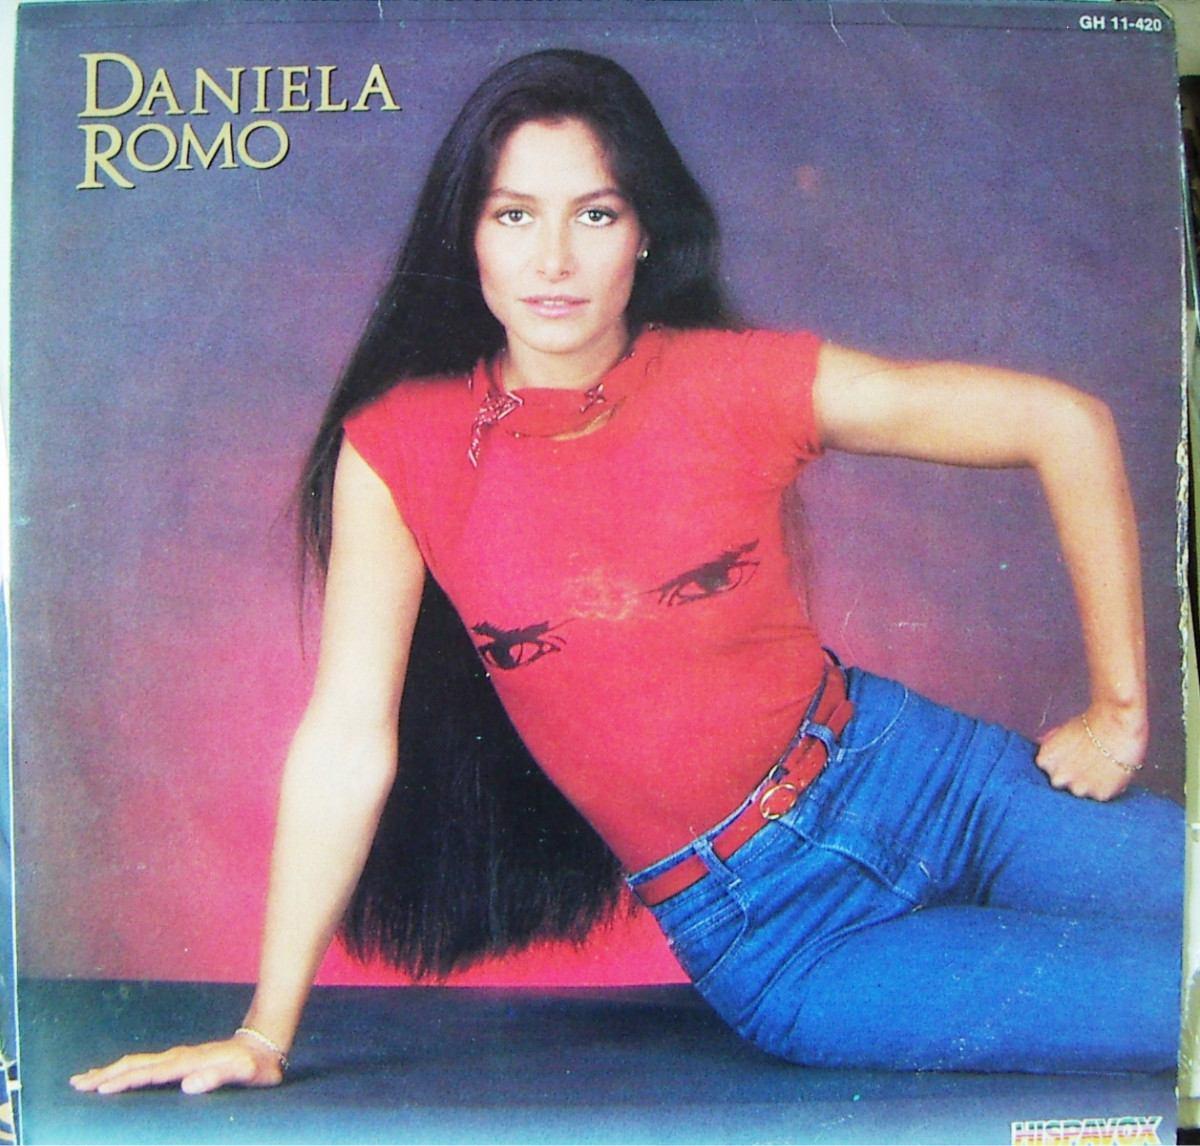 Daniela Romo, Mentiras, Lp 12´, - U$S 15.00 en Mercado Libre